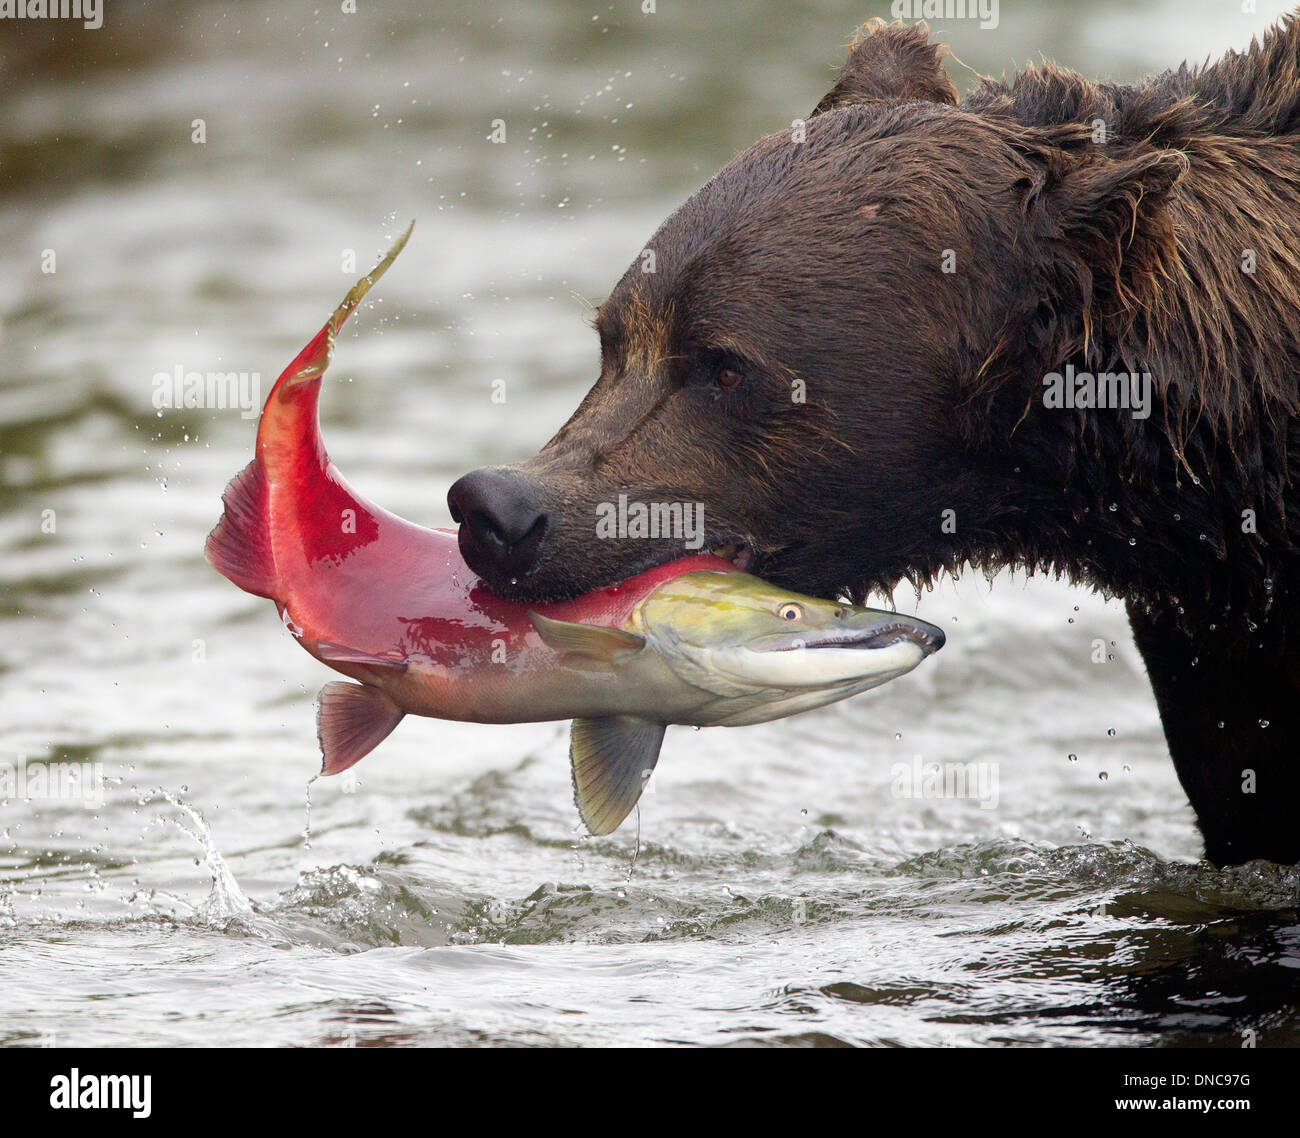 Oso Pardo de Alaska pescando salmones Imagen De Stock